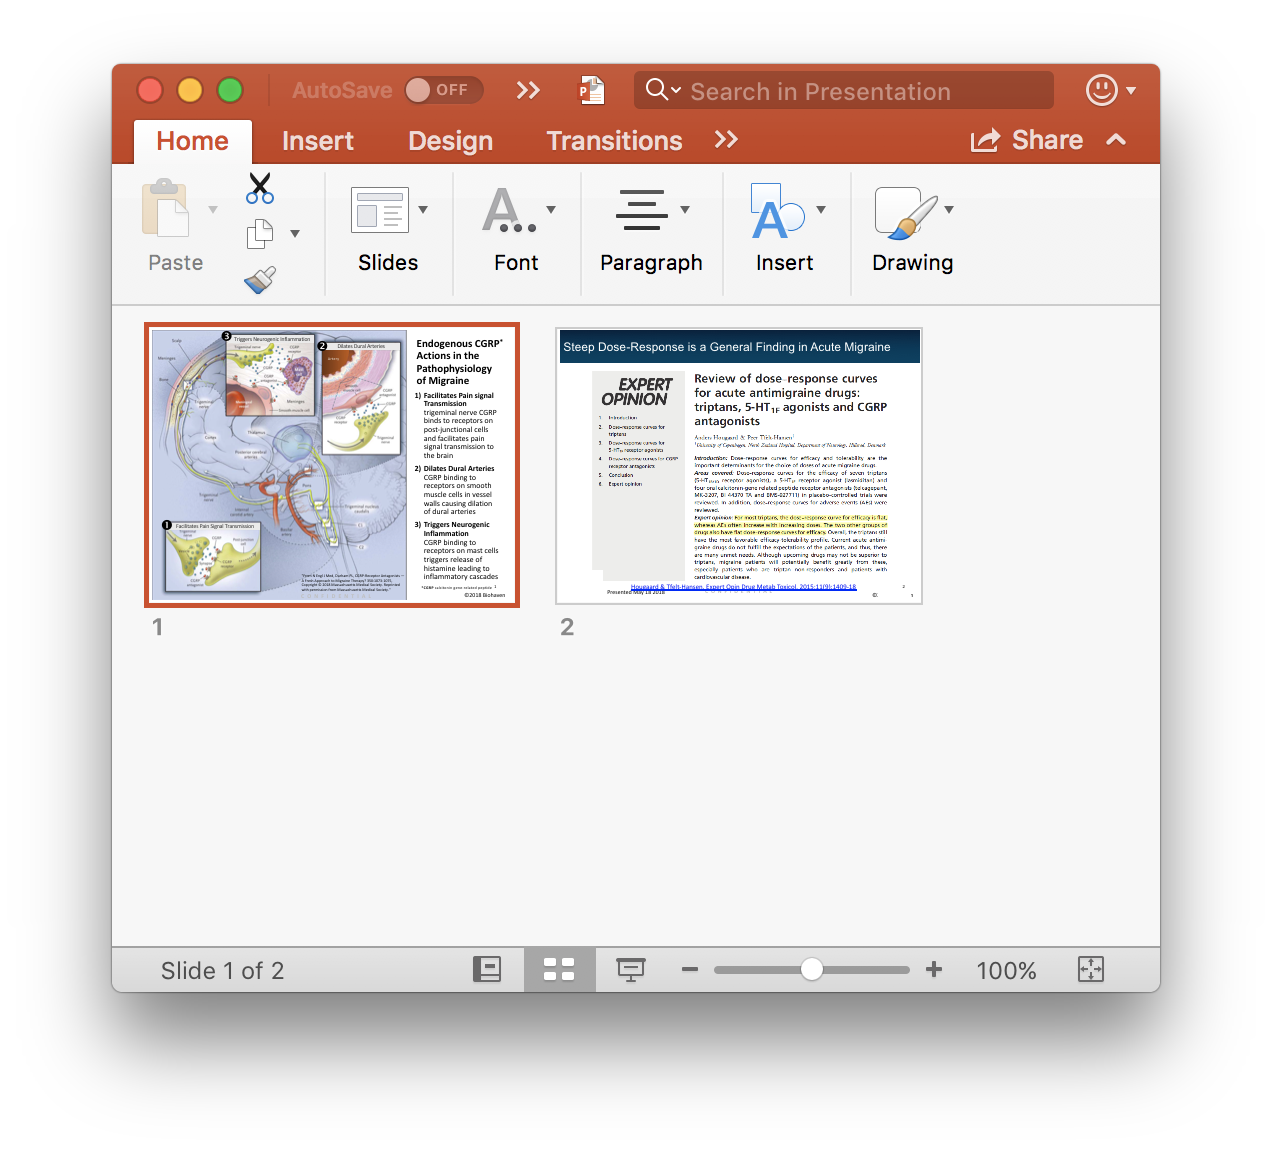 BUG REPORT PowerPoint for Mac Version 16 20 (181208) BREAKS